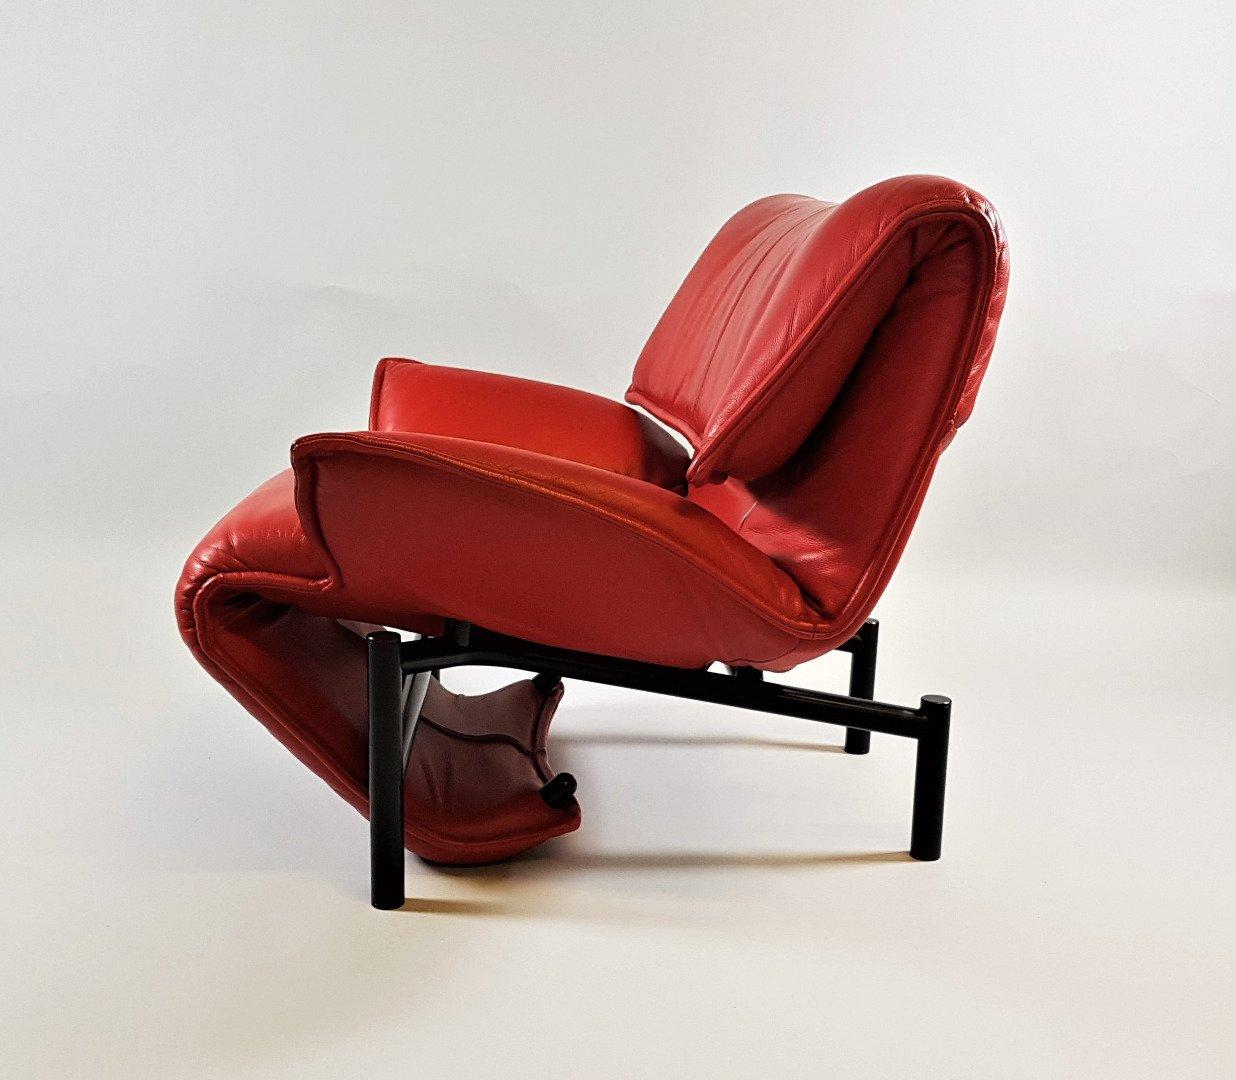 vintage veranda stuhl mit lederbezug von vico magistretti f r cassina bei pamono kaufen. Black Bedroom Furniture Sets. Home Design Ideas